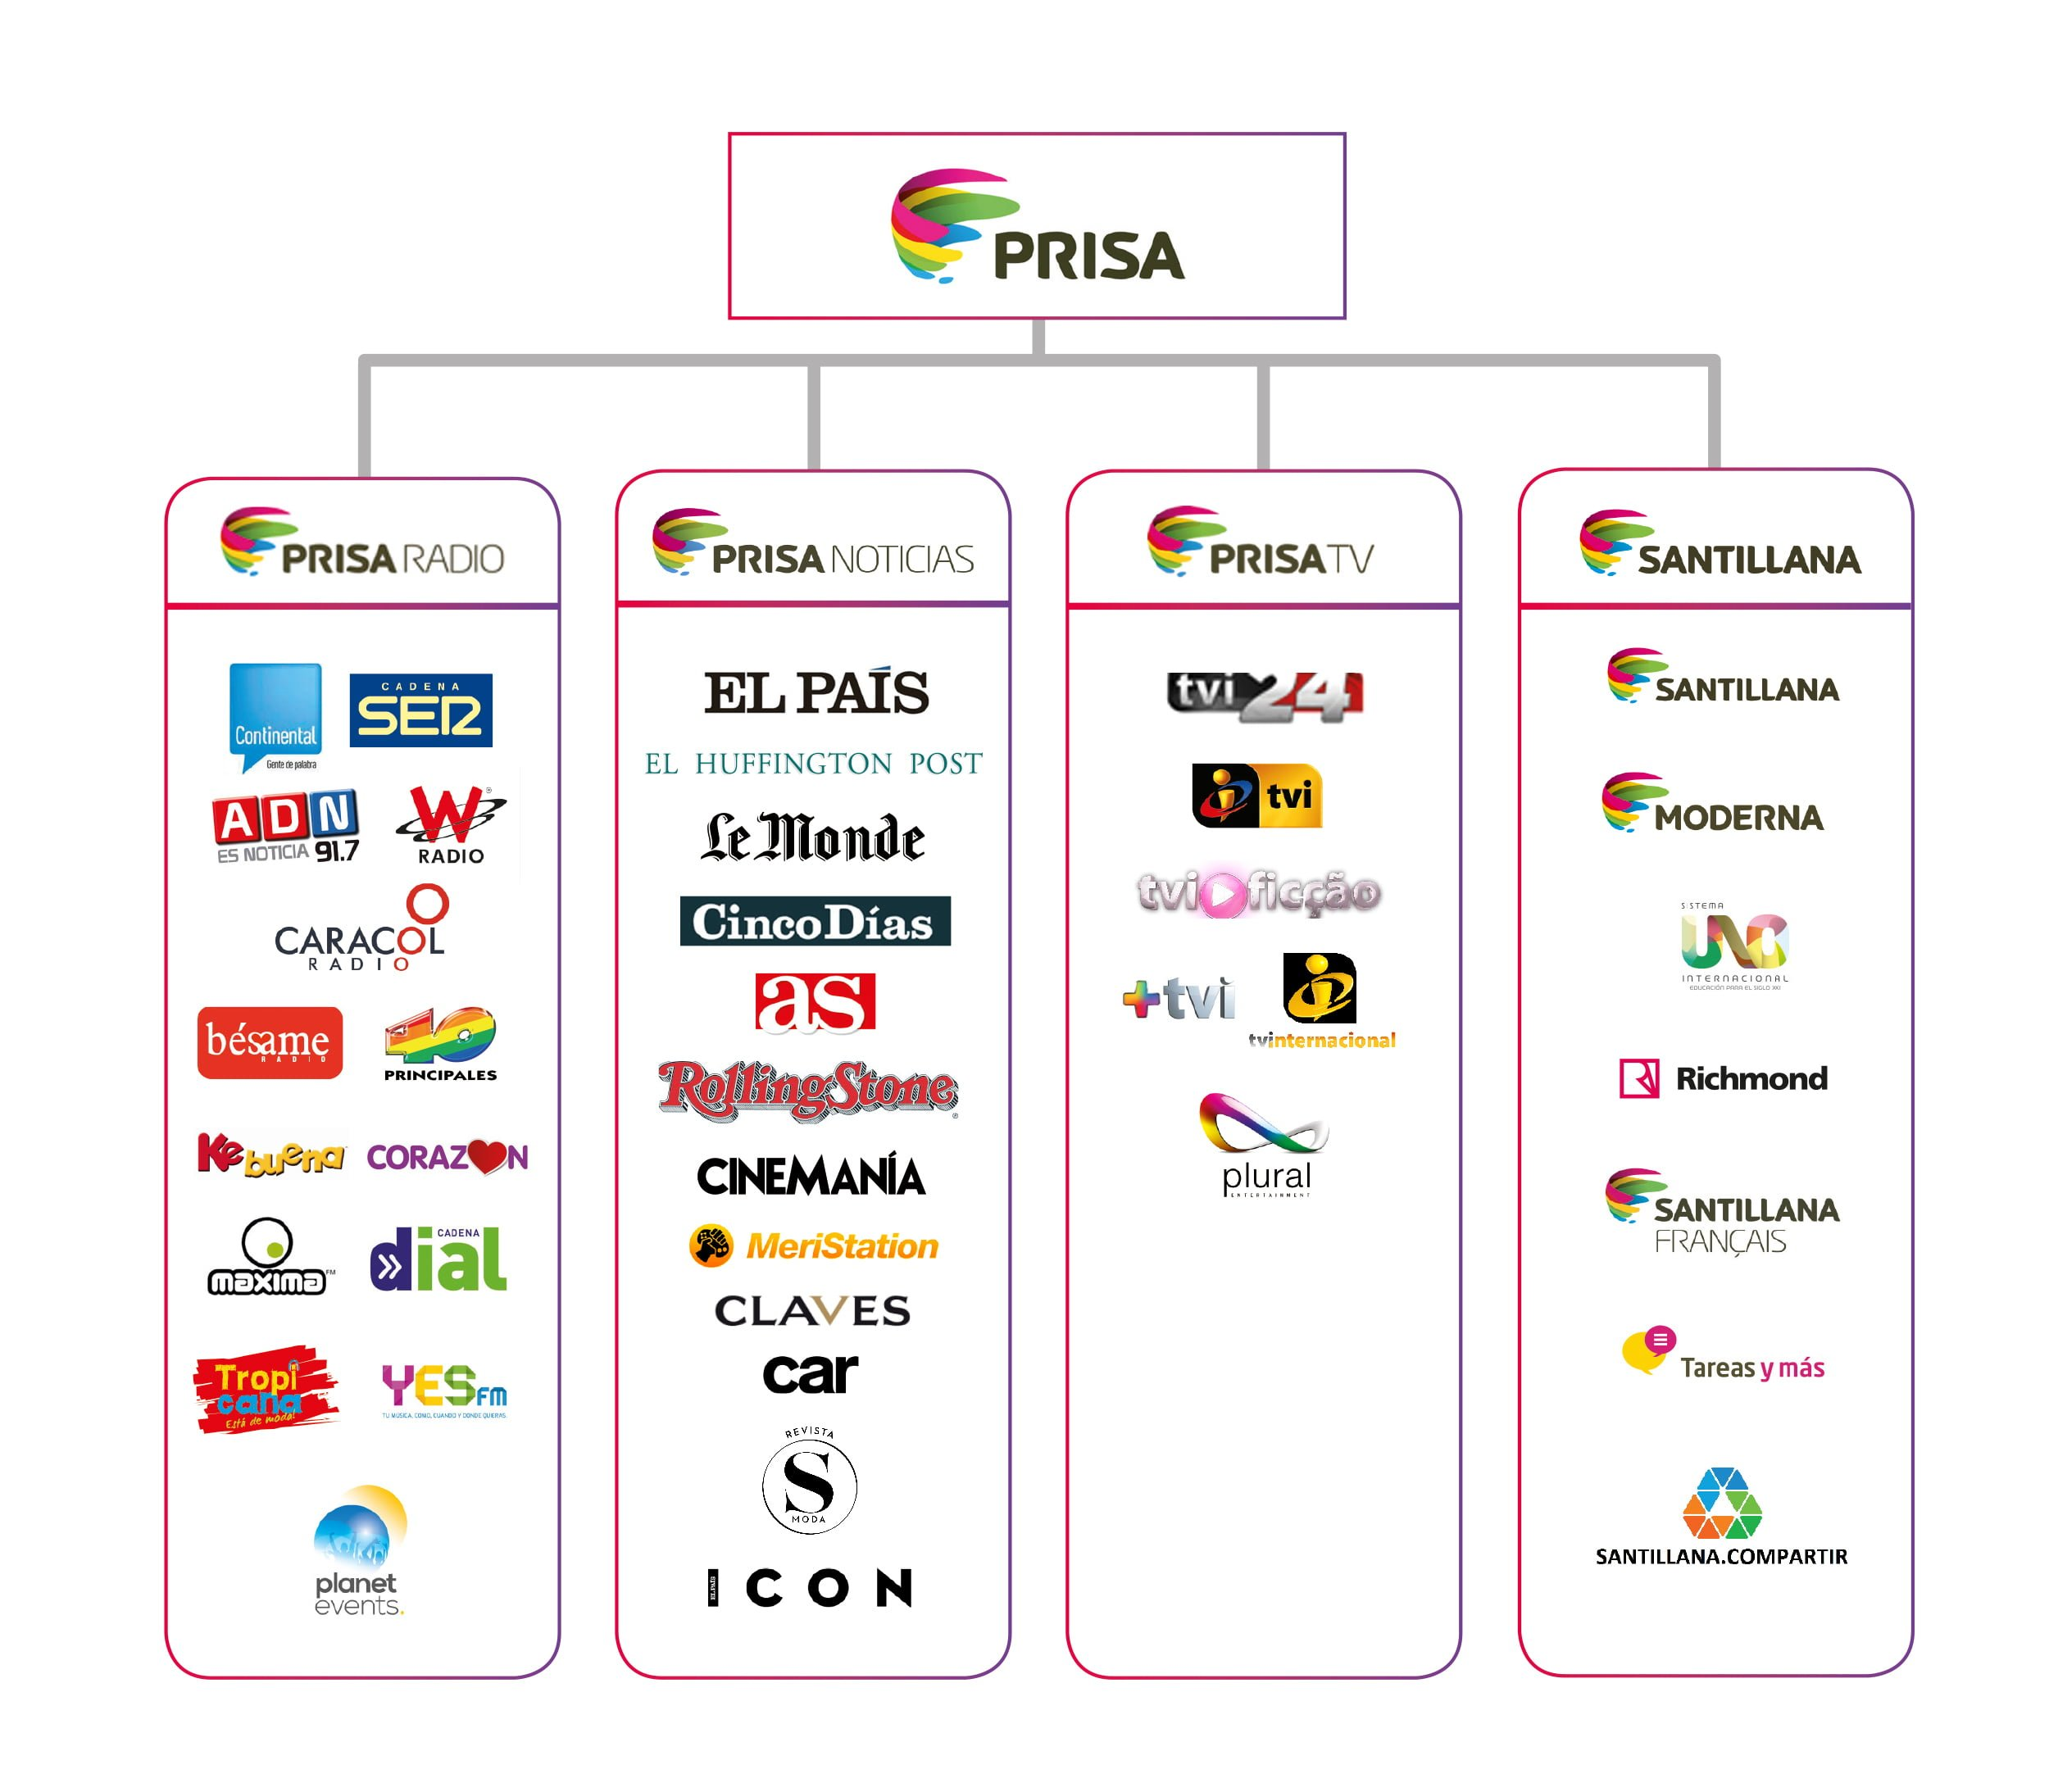 Empresas de Grupo Prisa